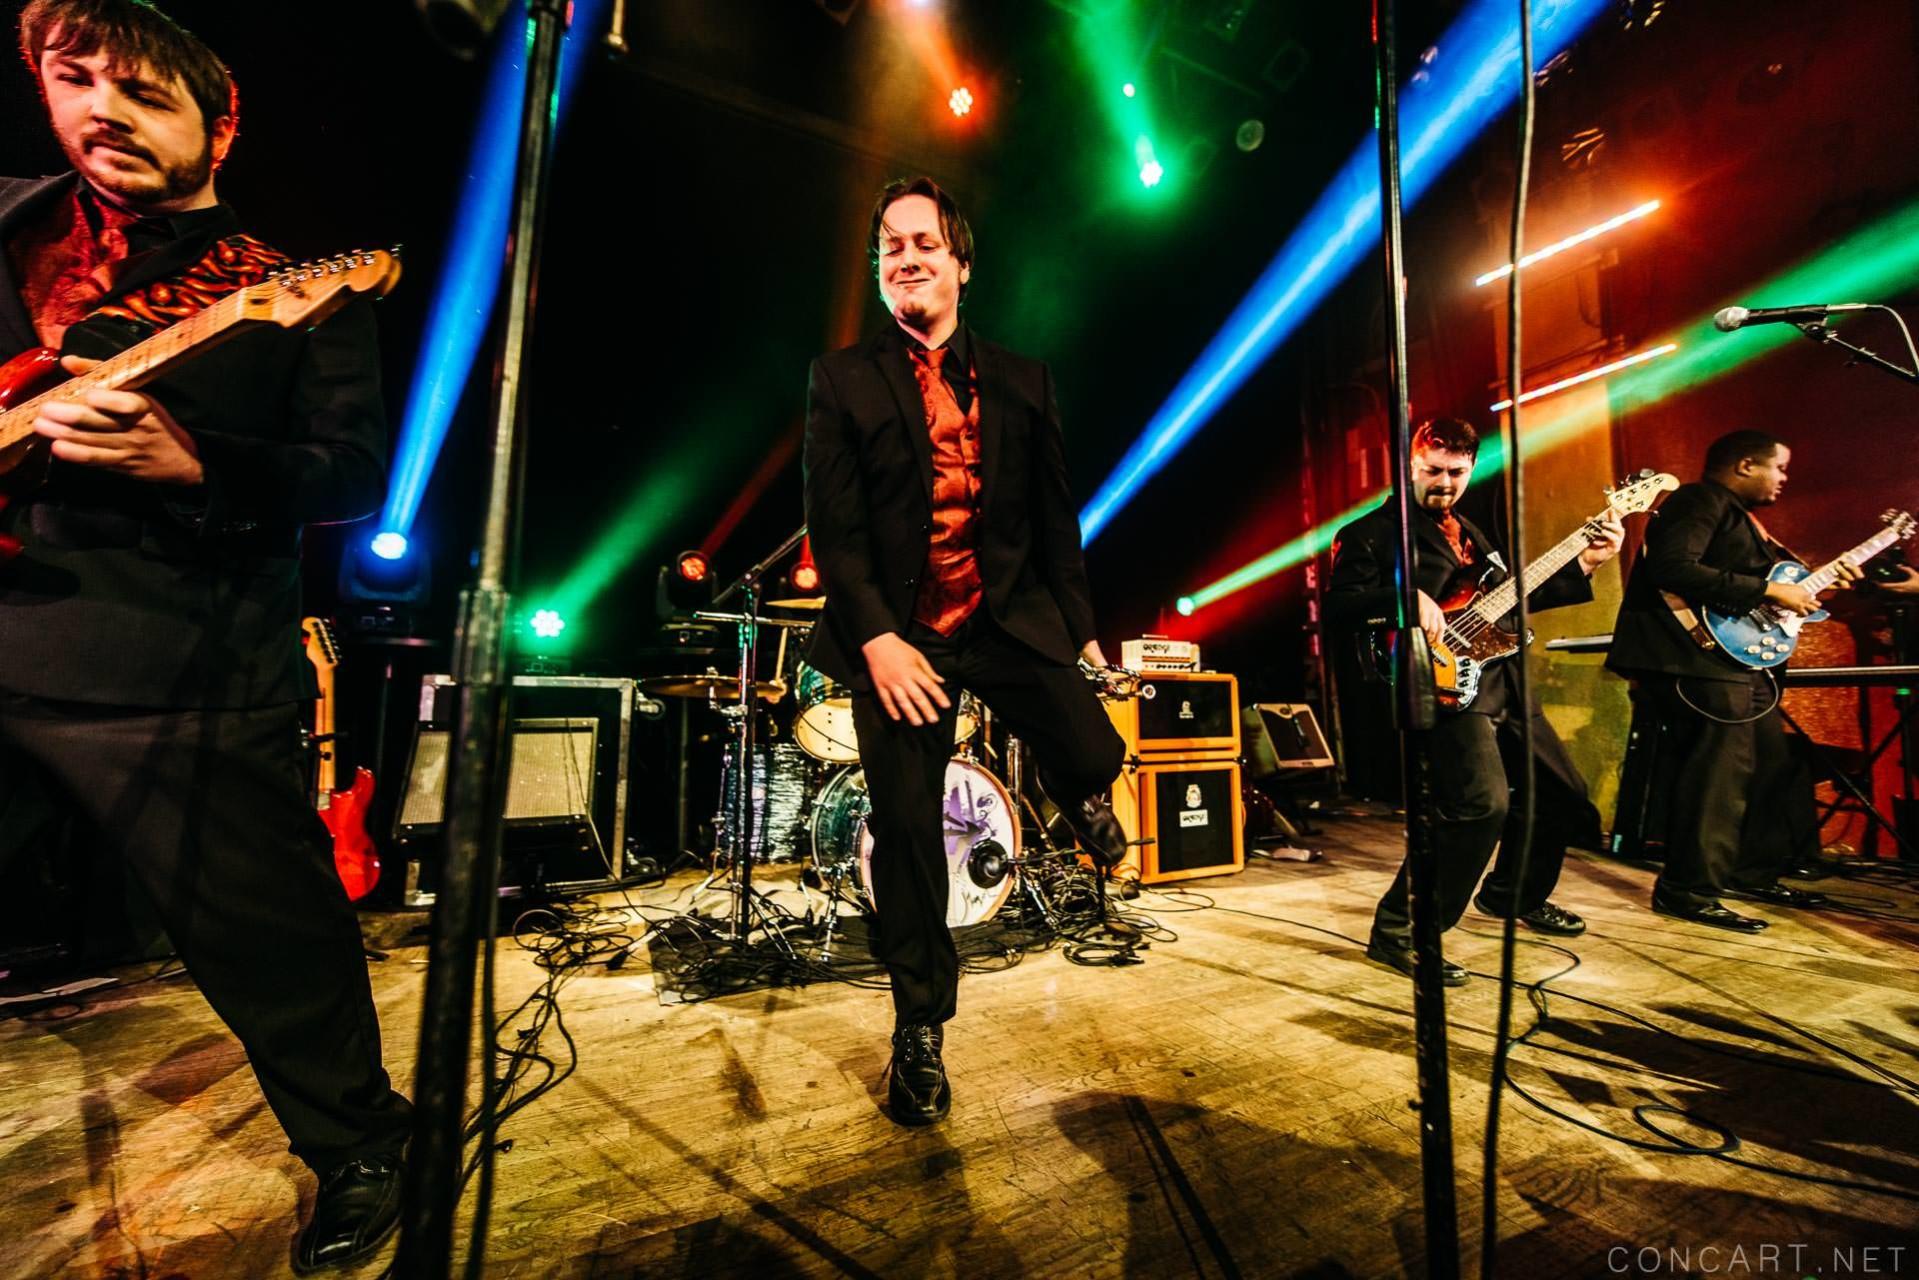 Audiodacity photo by Sean Molin 2